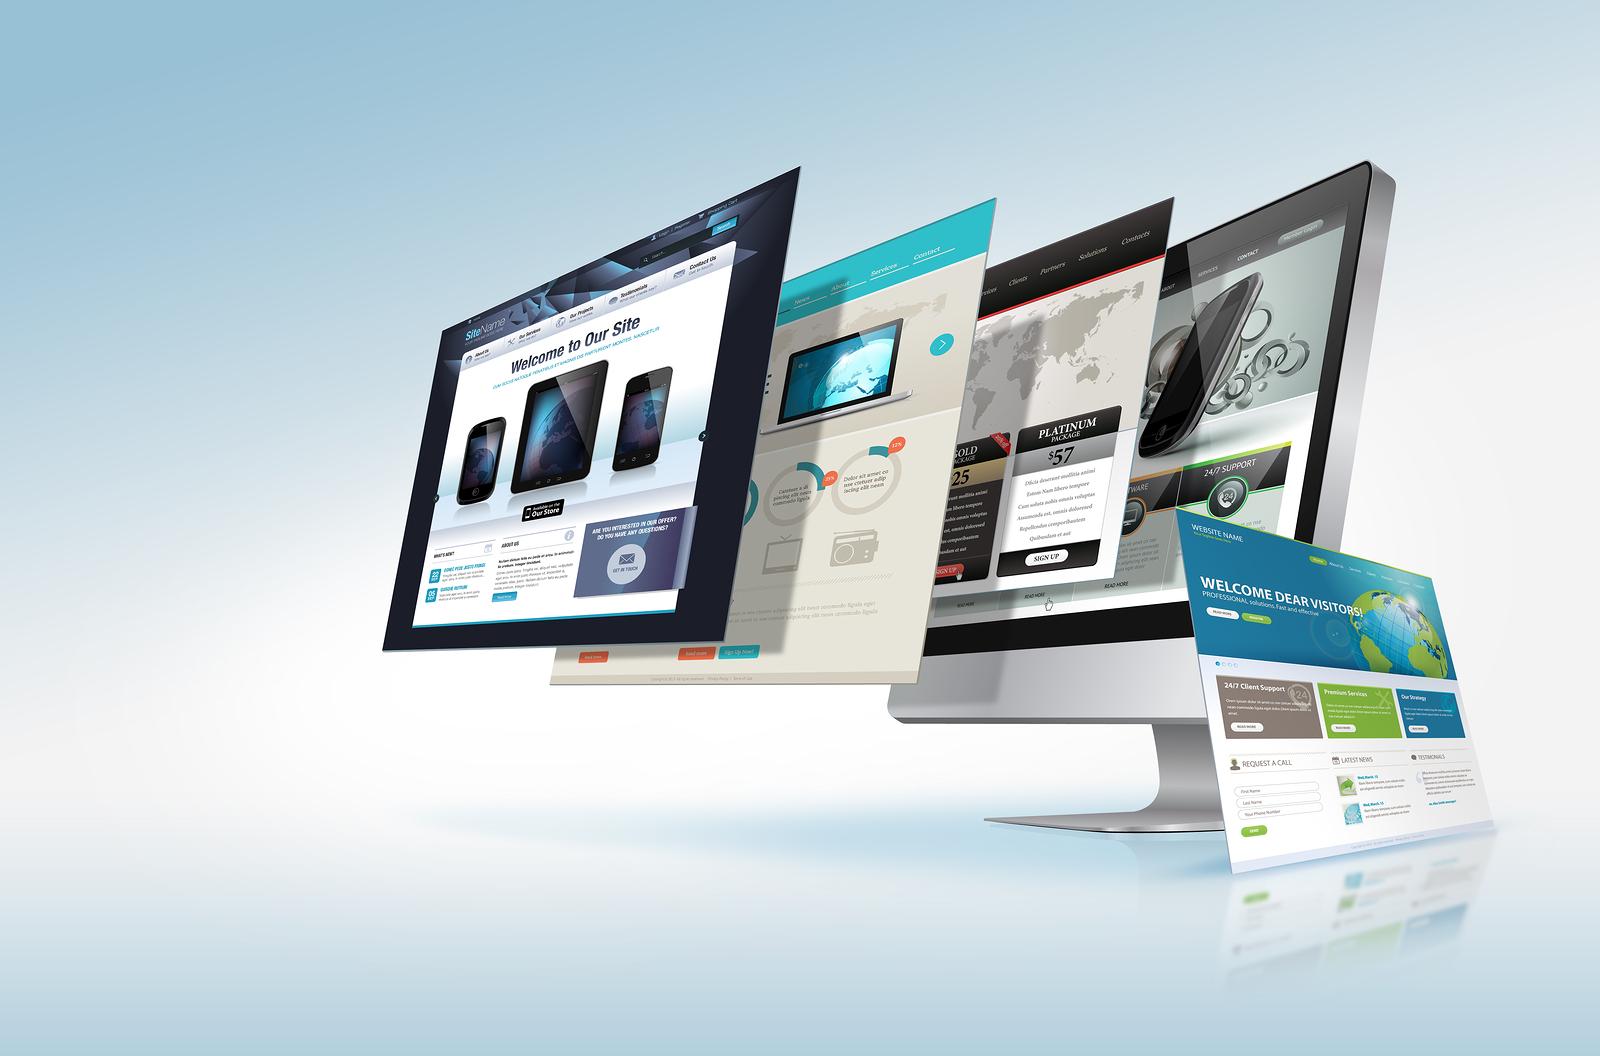 go to design & media services